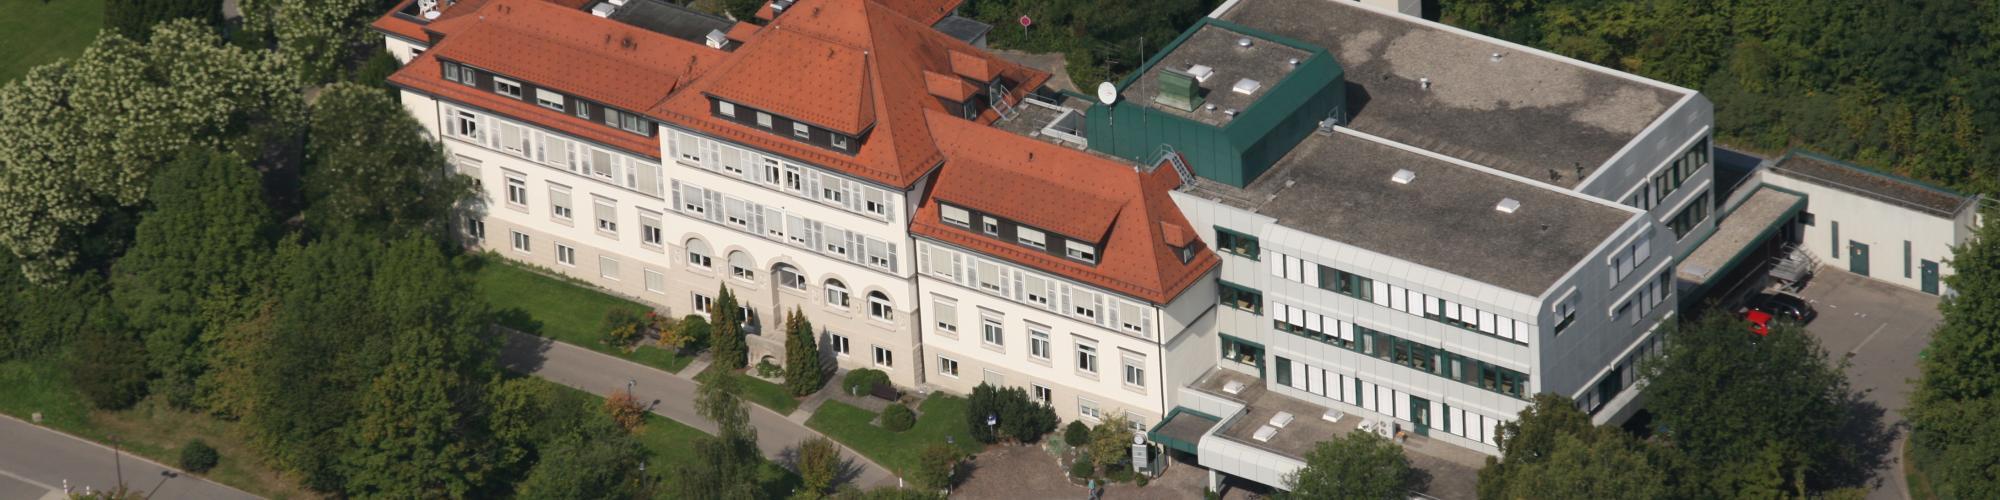 SRH Kliniken GmbH